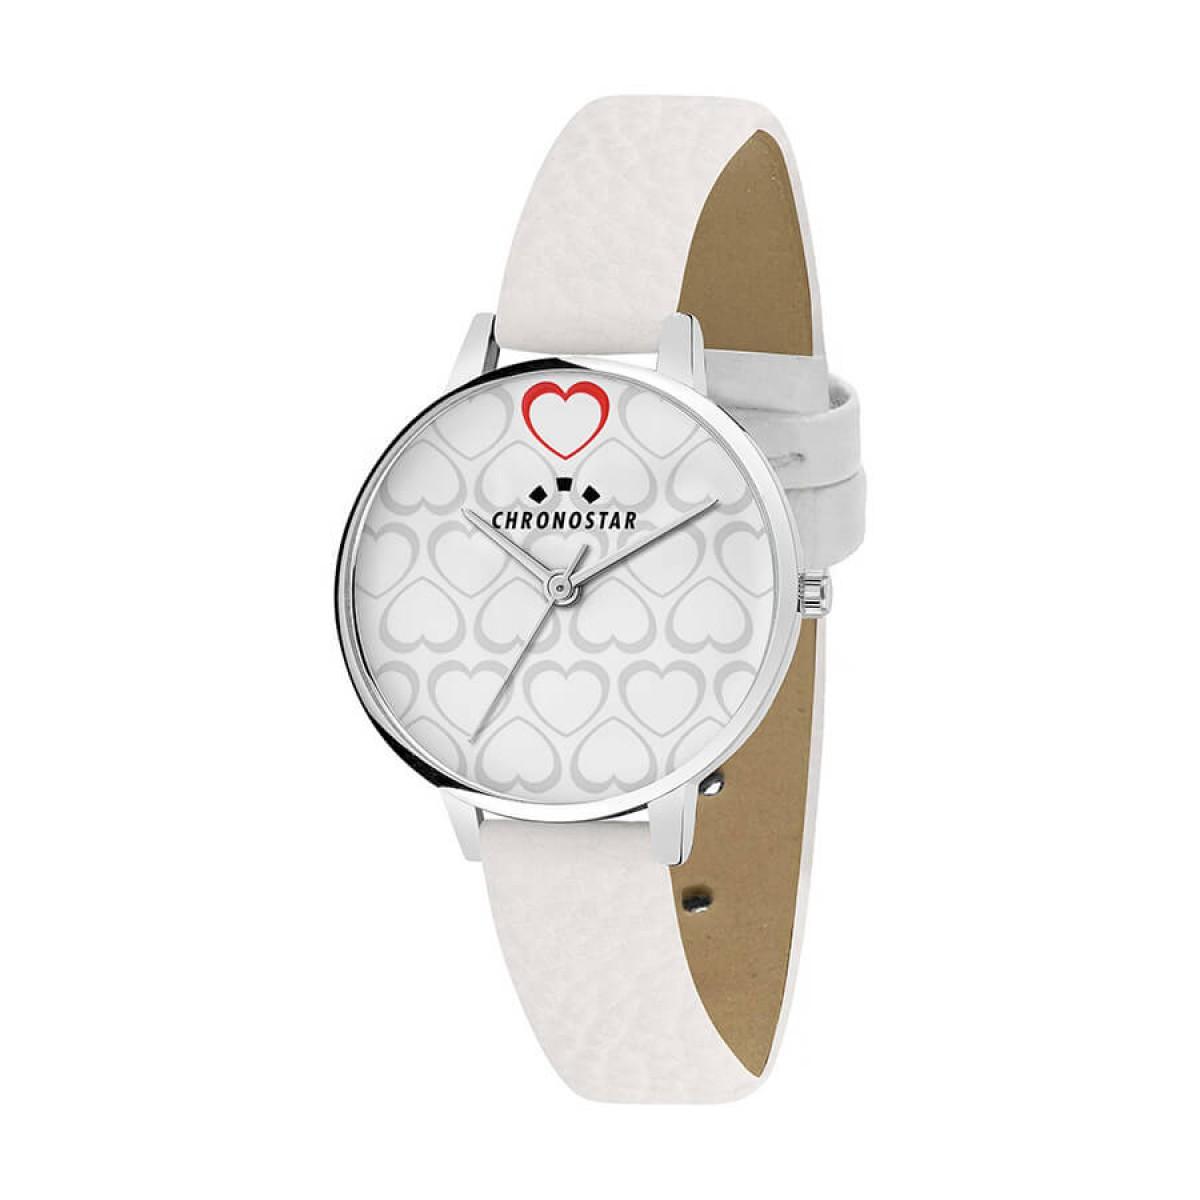 Часовник Chronostar R3751267511